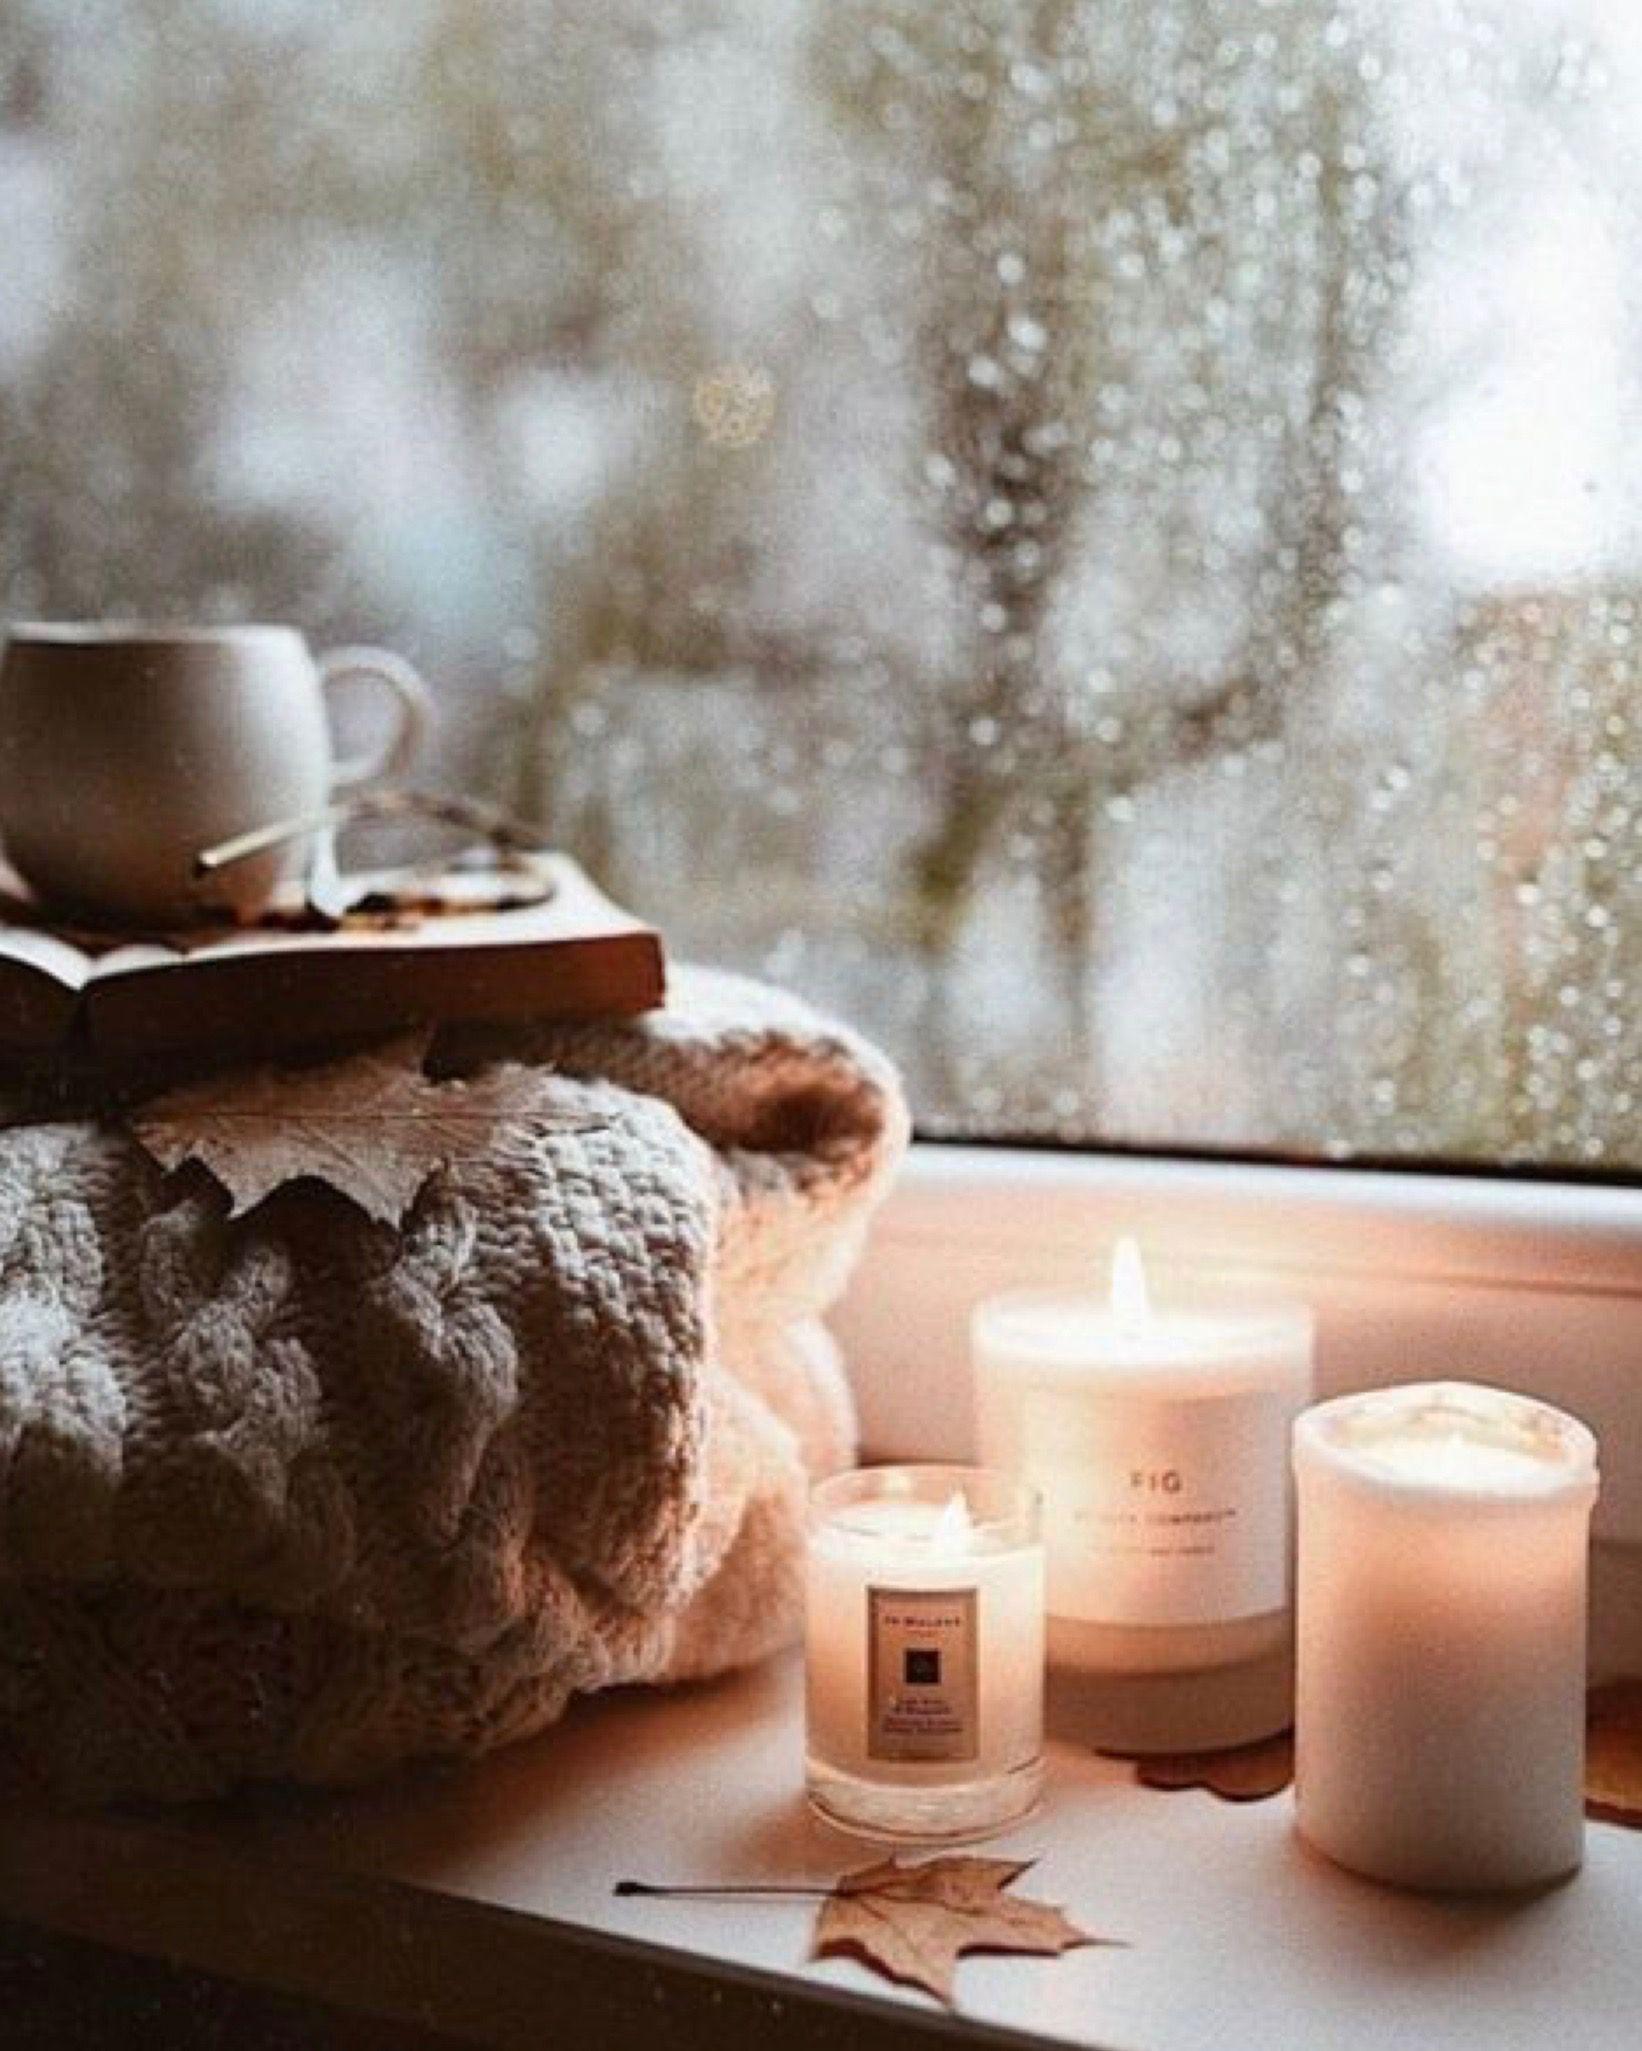 lit candles, coffee, rain, window, blanker Candle